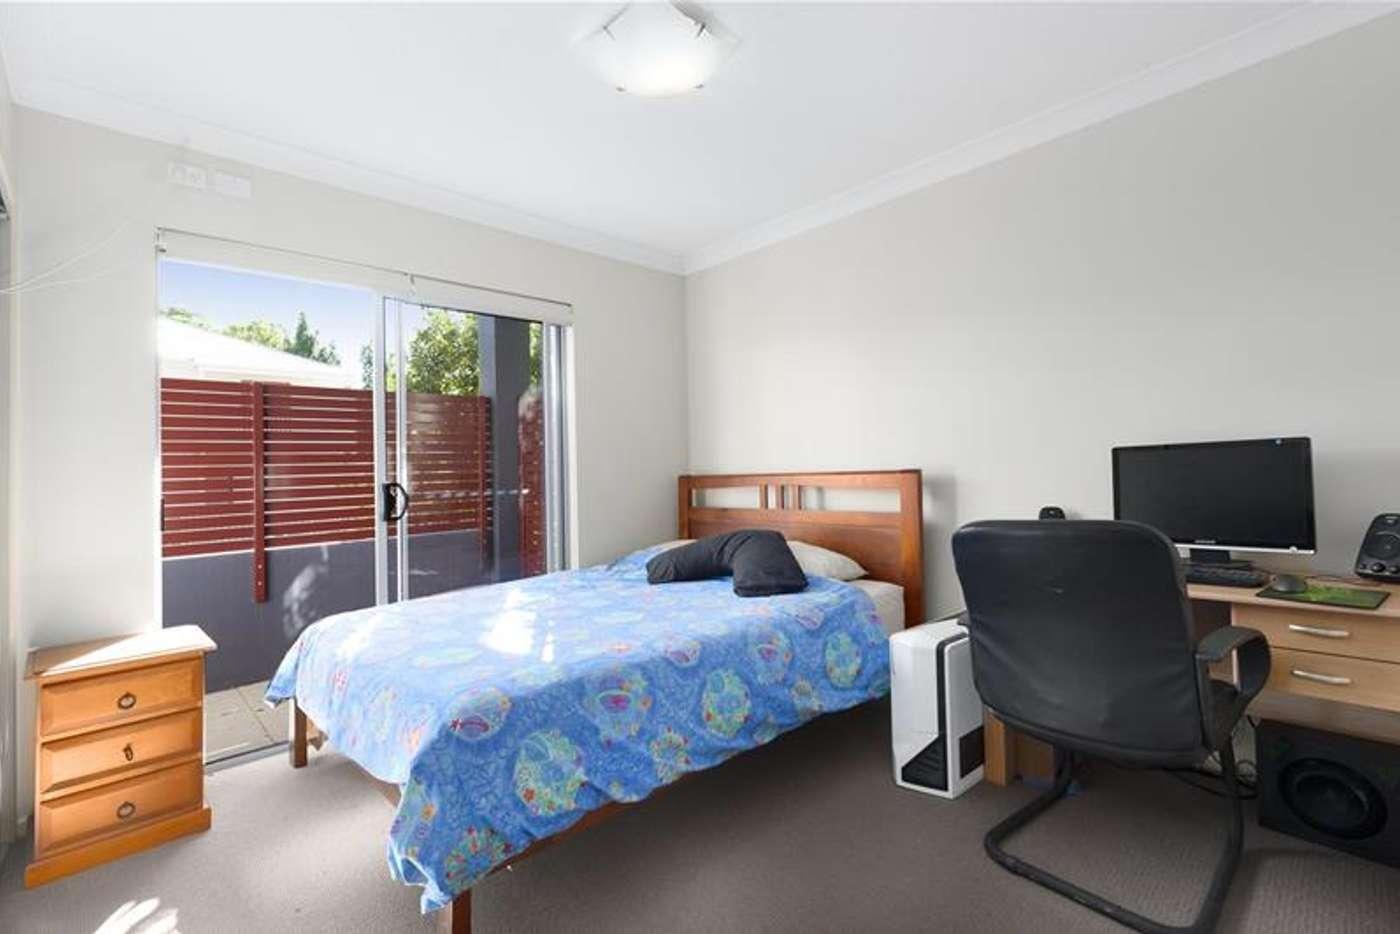 Sixth view of Homely apartment listing, 04/111 Samford Road, Enoggera QLD 4051